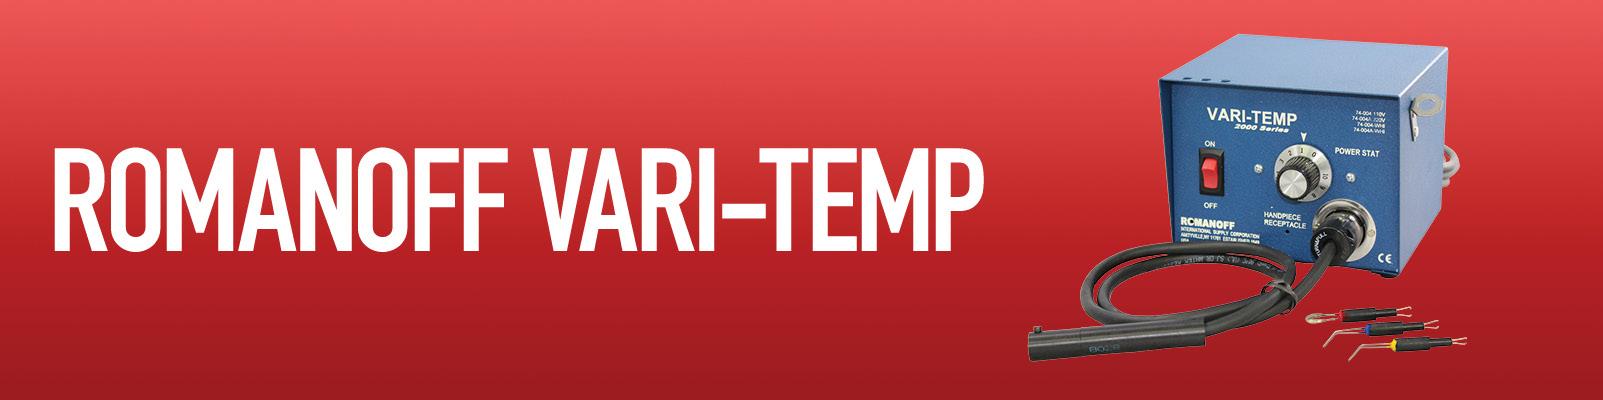 Romanoff Vari-Temp